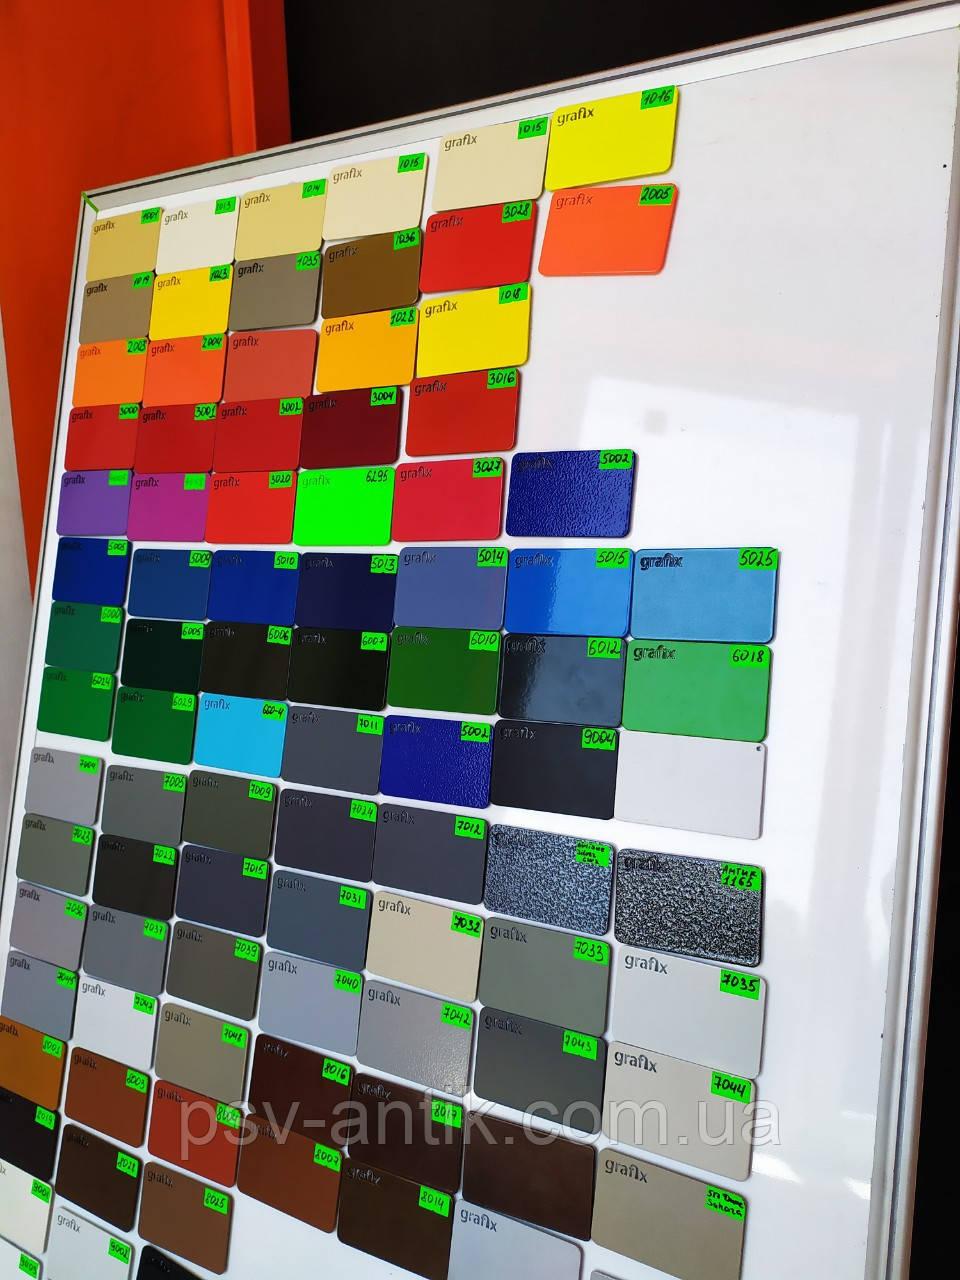 Порошковая краска глянцевая, полиэфирная, архитектурная, 5019